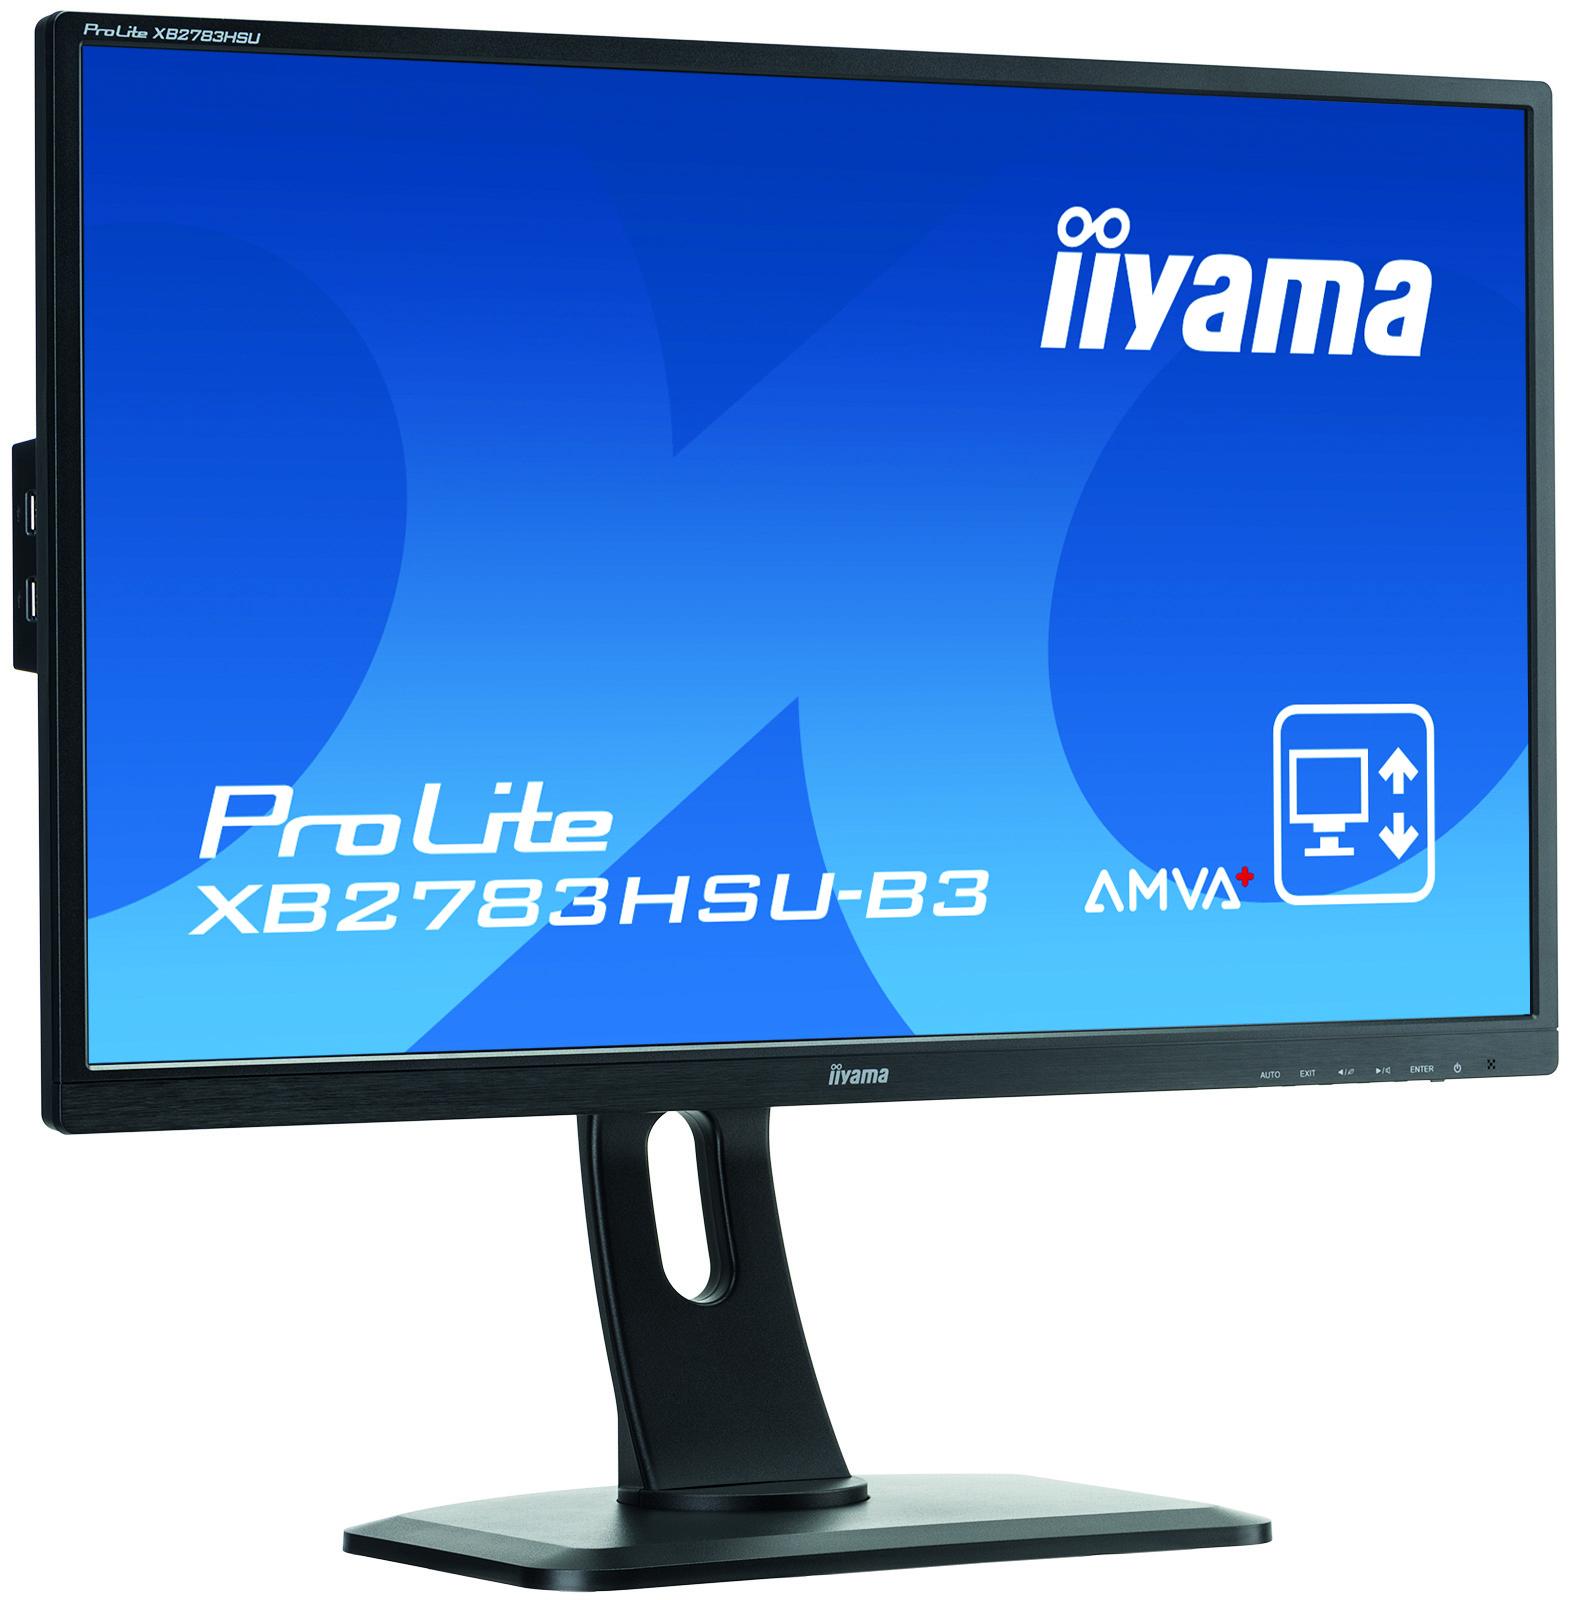 Iiyama ProLite XB2783HSU-B3 - 68,6 cm (27 Zoll) - 1920 x 1080 Pixel - Full HD - LED - 4 ms - Schwarz